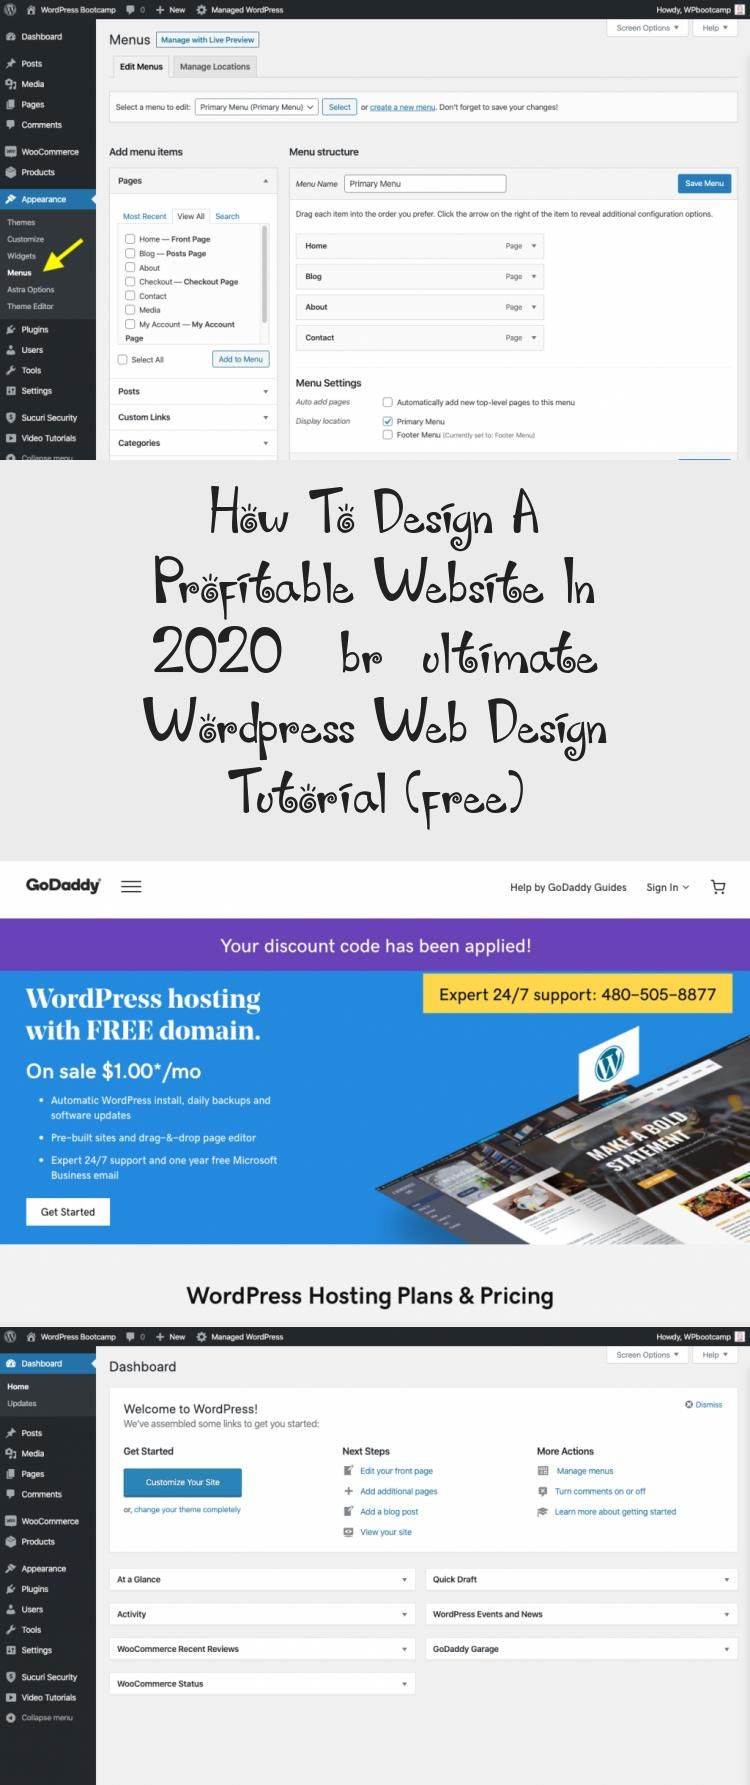 En Blog En Blog In 2020 Wordpress Web Design Web Design Web Design Marketing